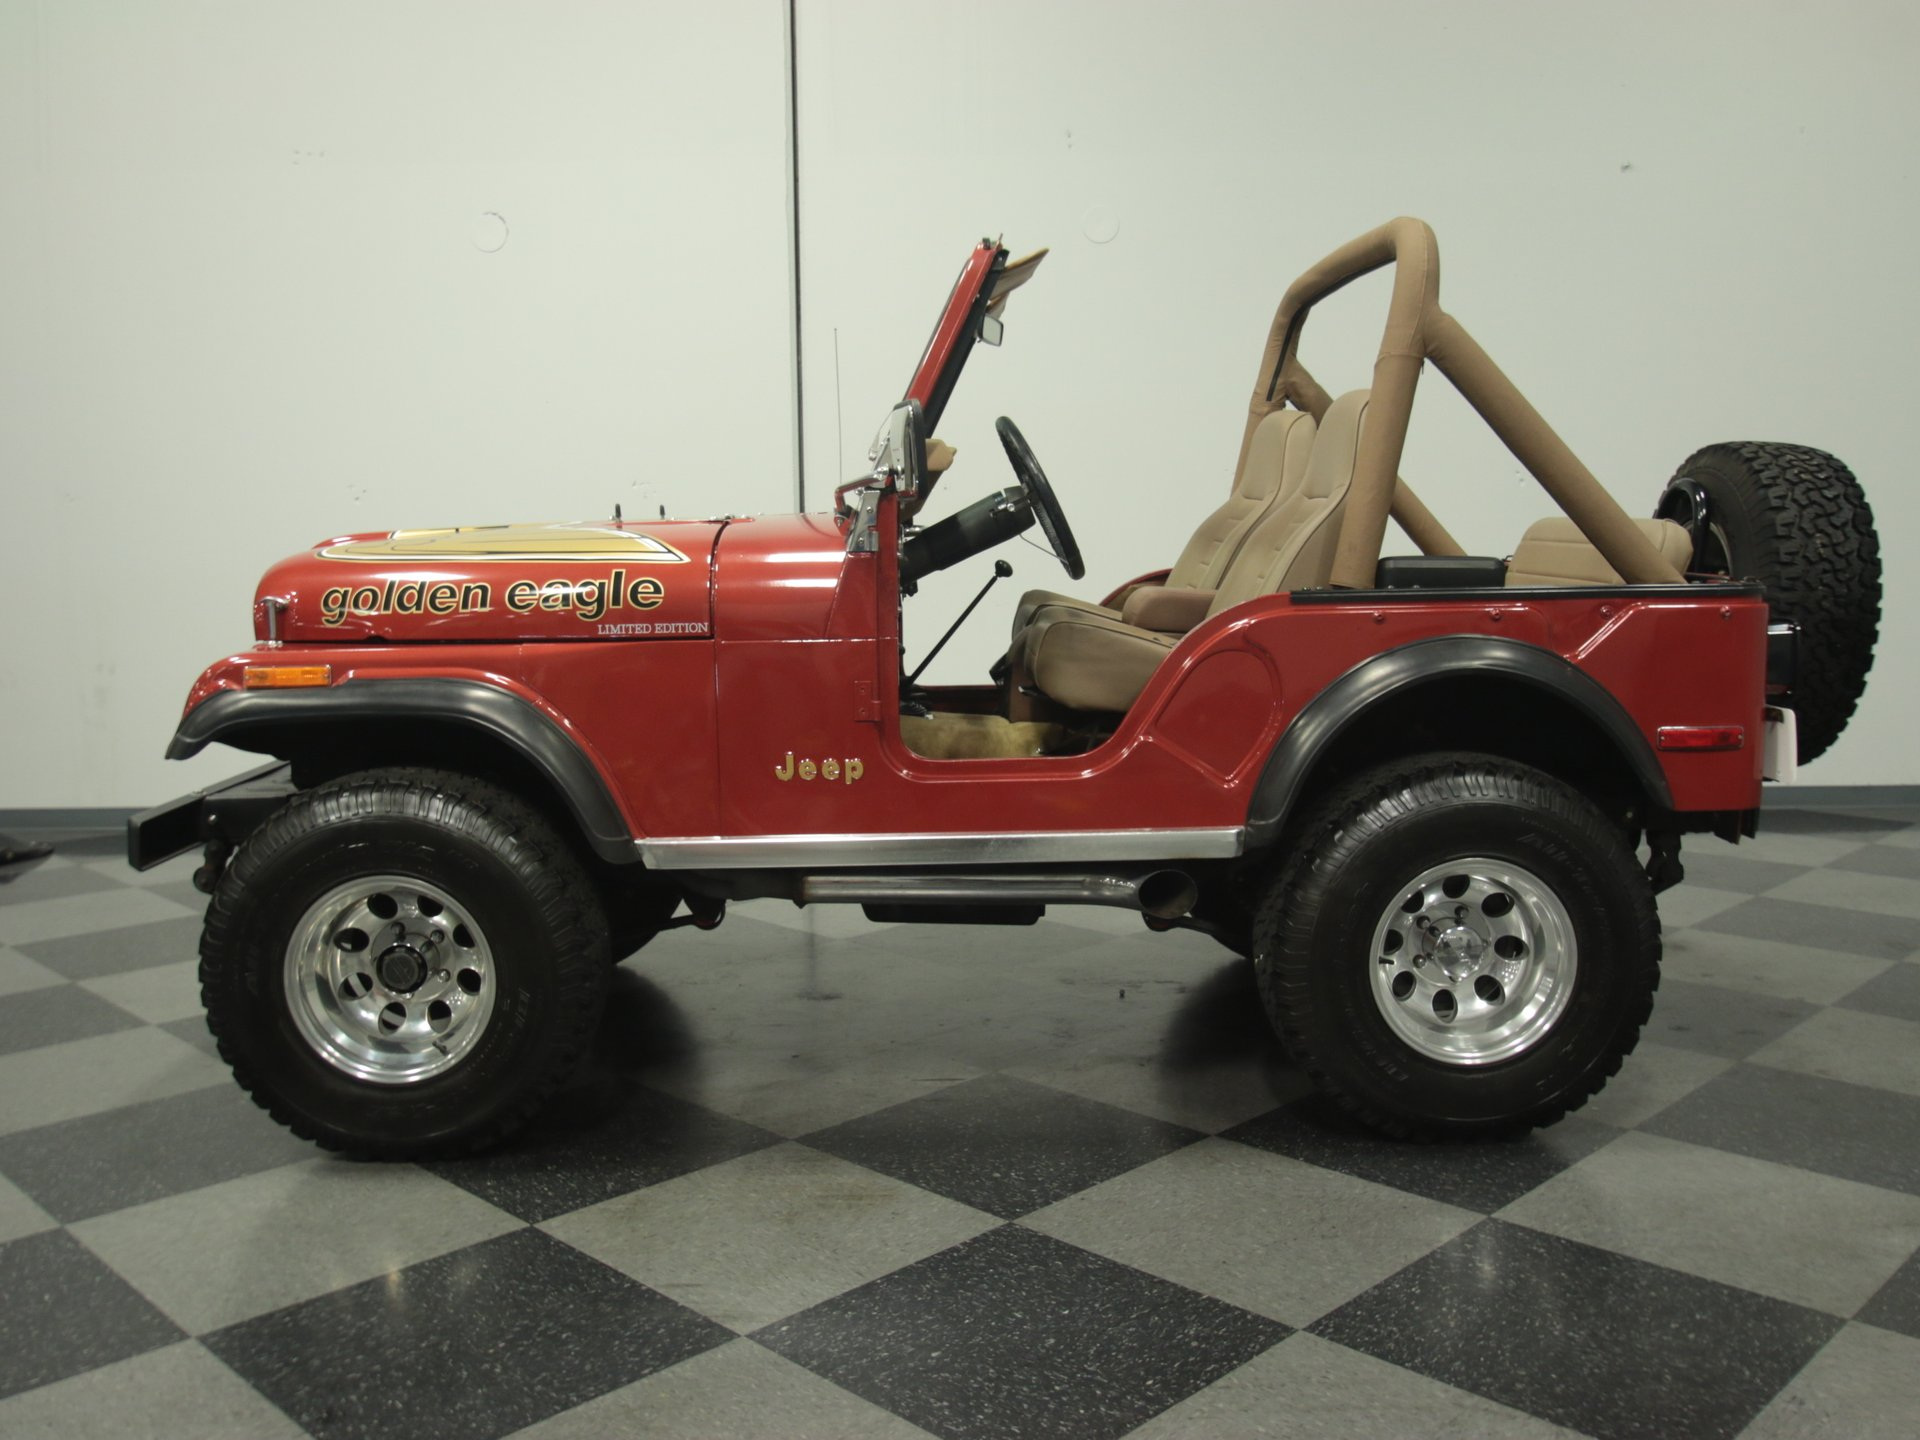 1977 jeep cj5 golden eagle